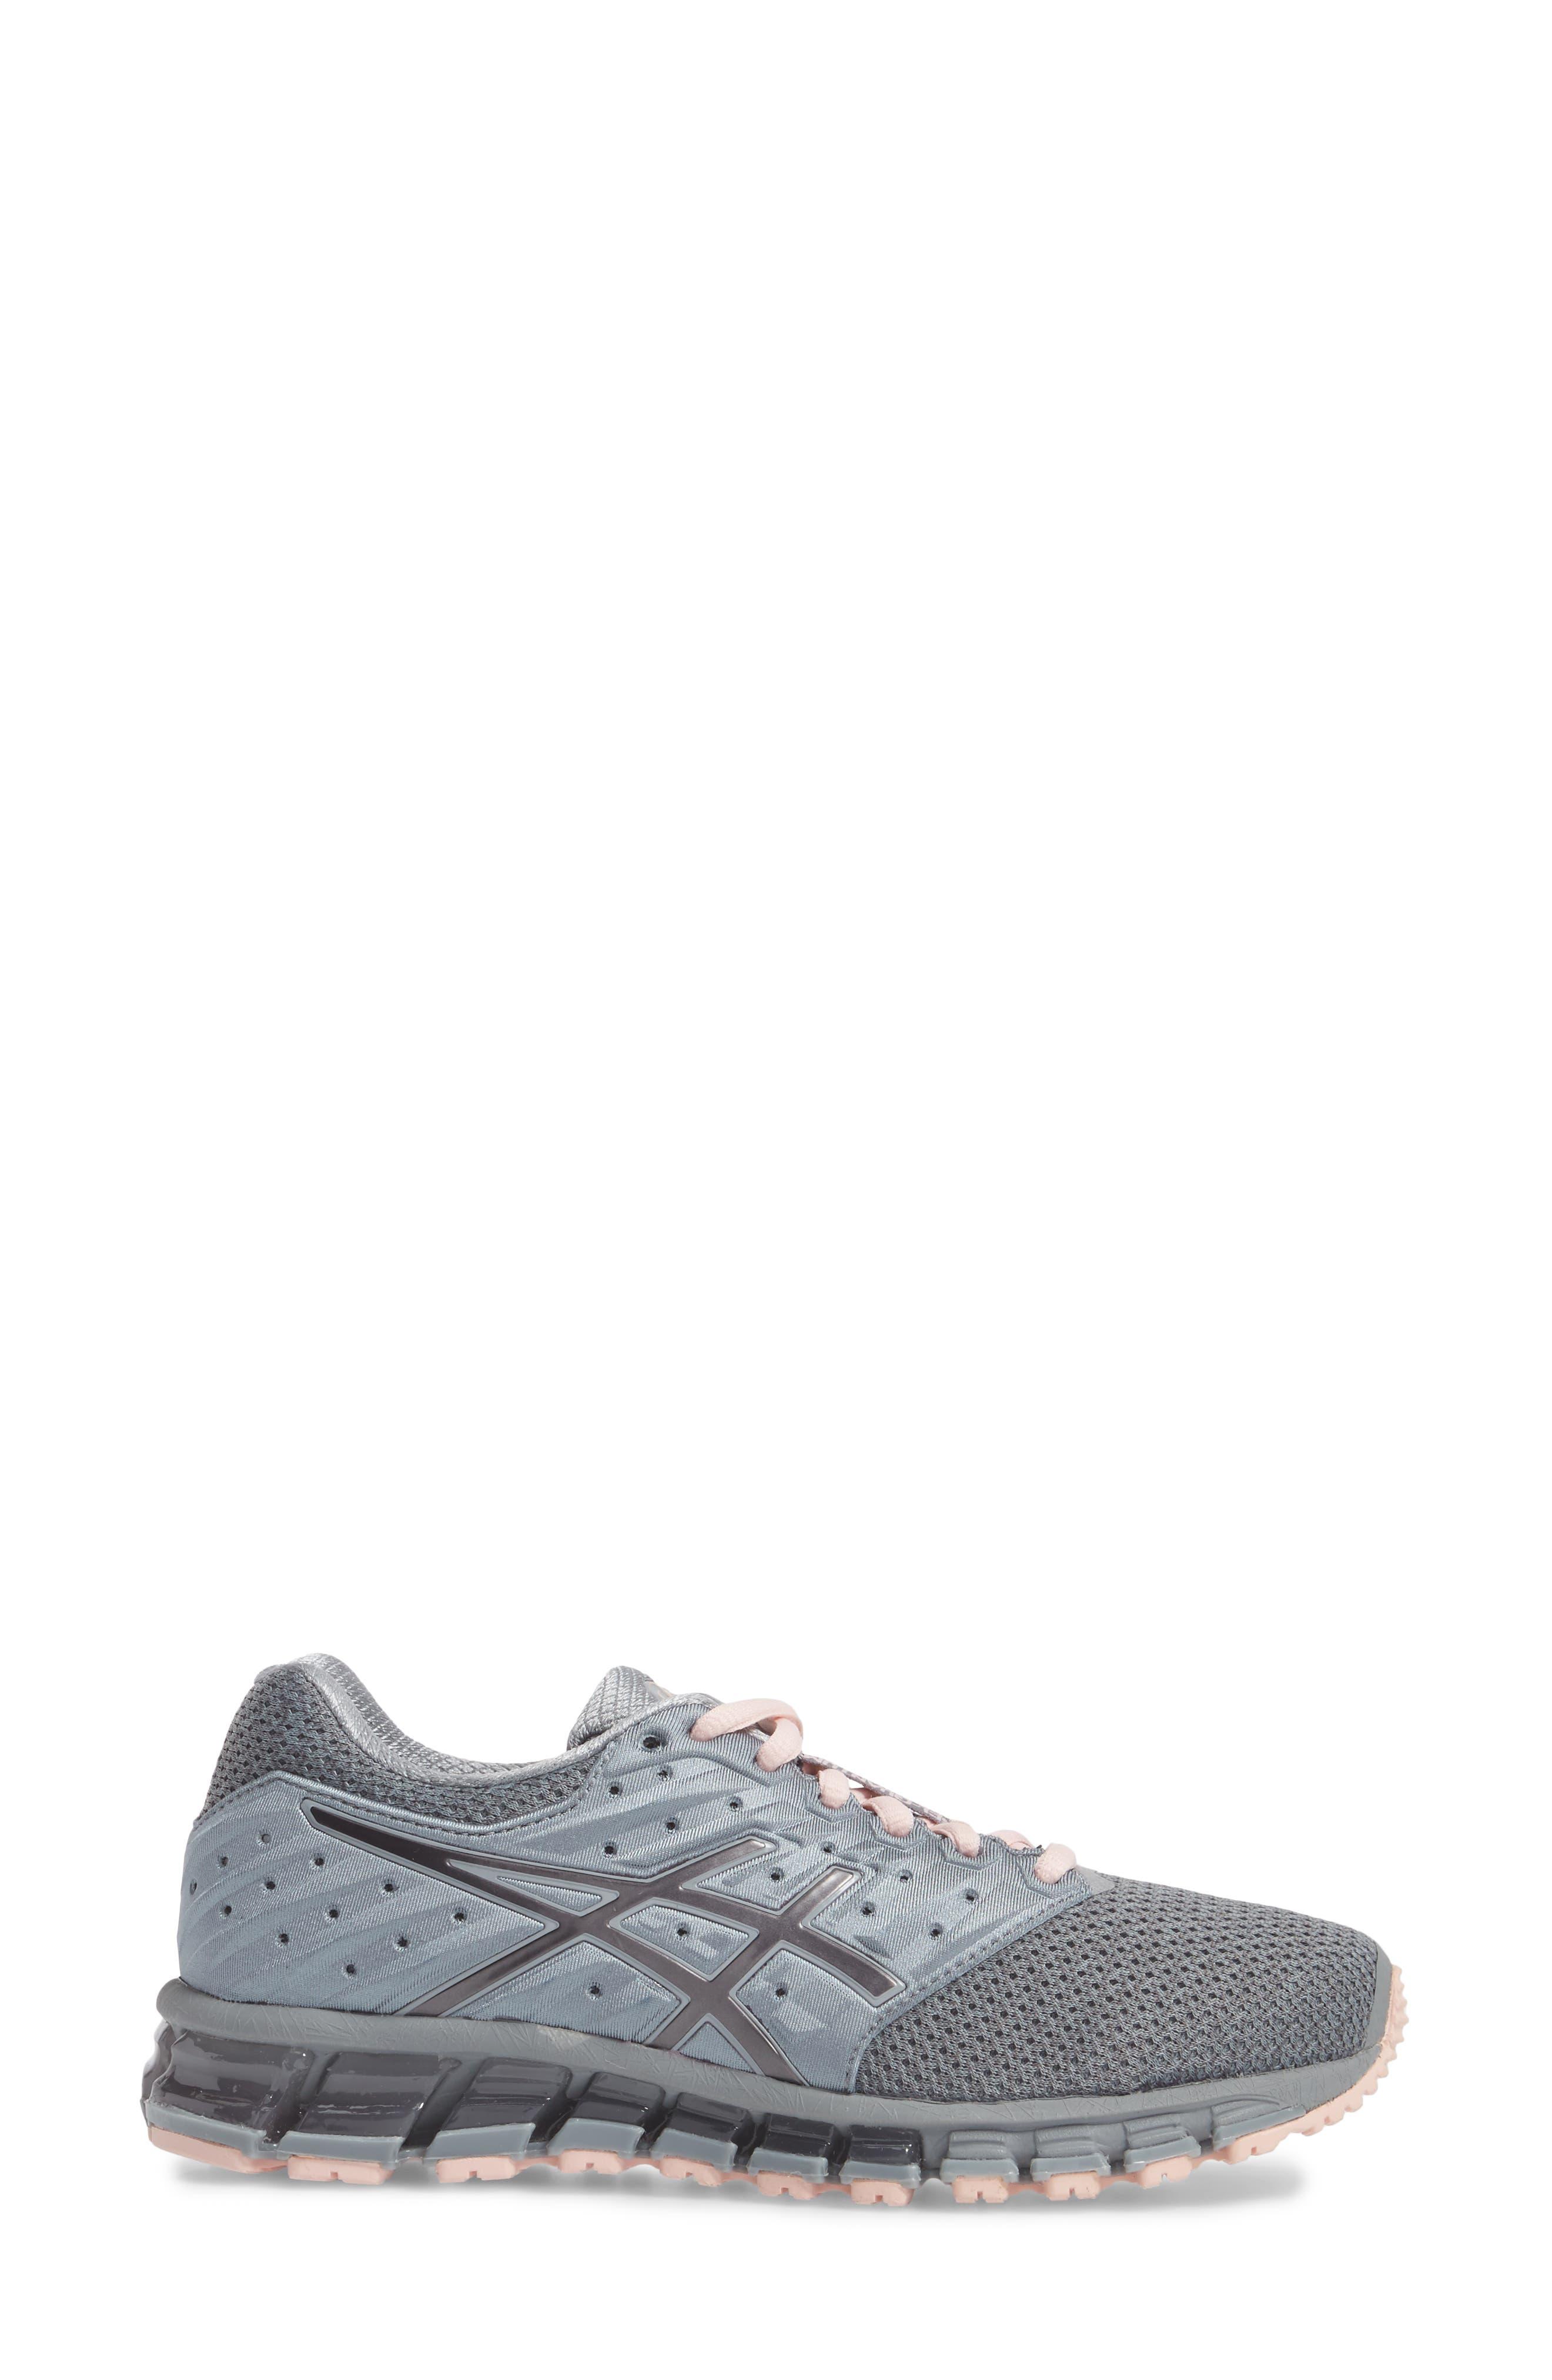 'GEL-Quantum 180 2' Running Shoe,                             Alternate thumbnail 16, color,